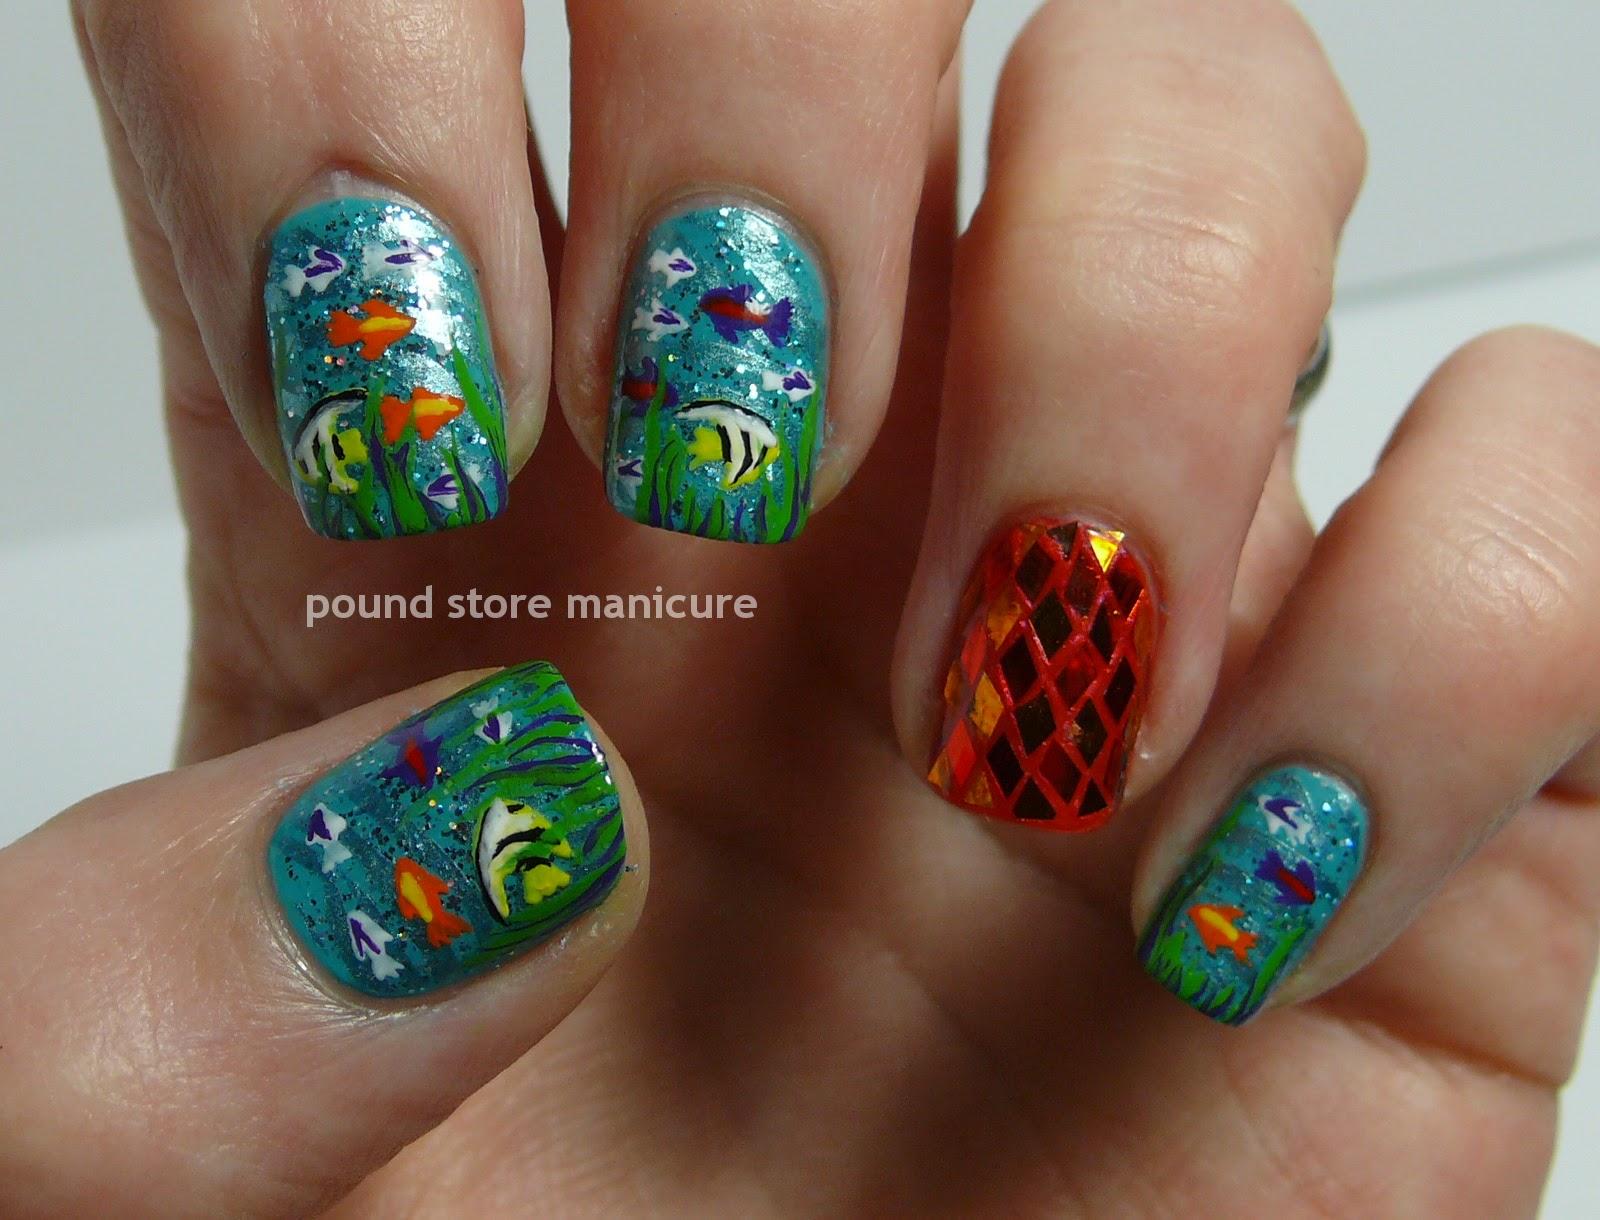 Pound Store Manicure: April 2014